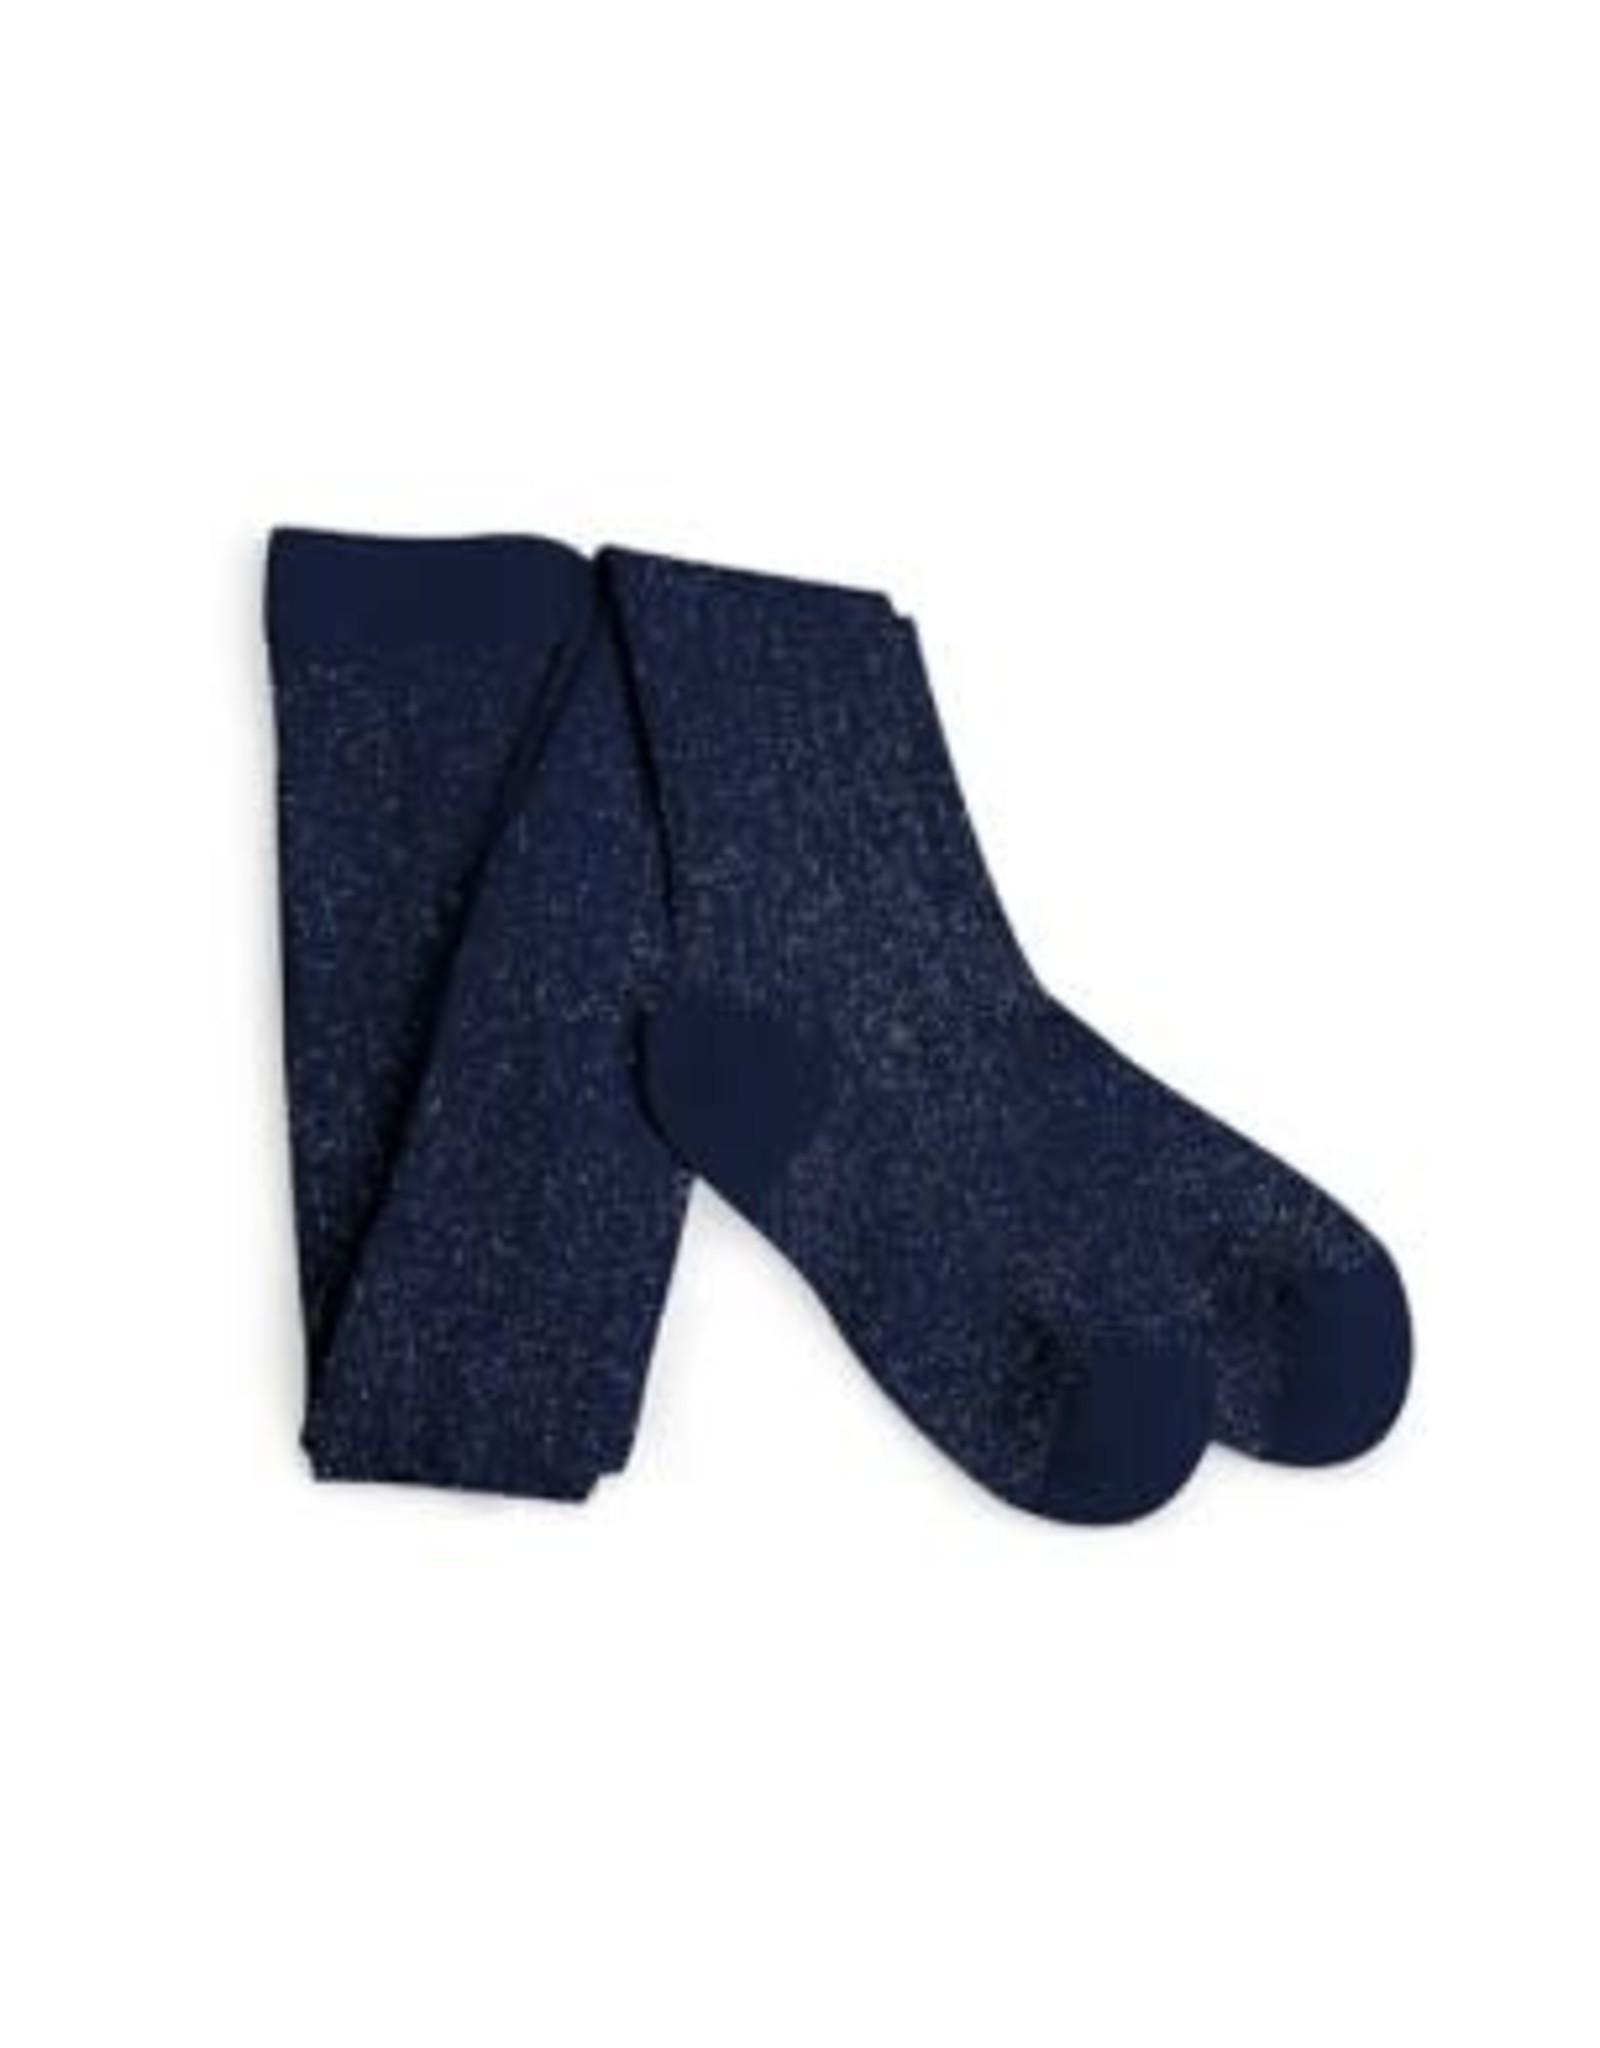 Collégien kousenbroek blauw glitter